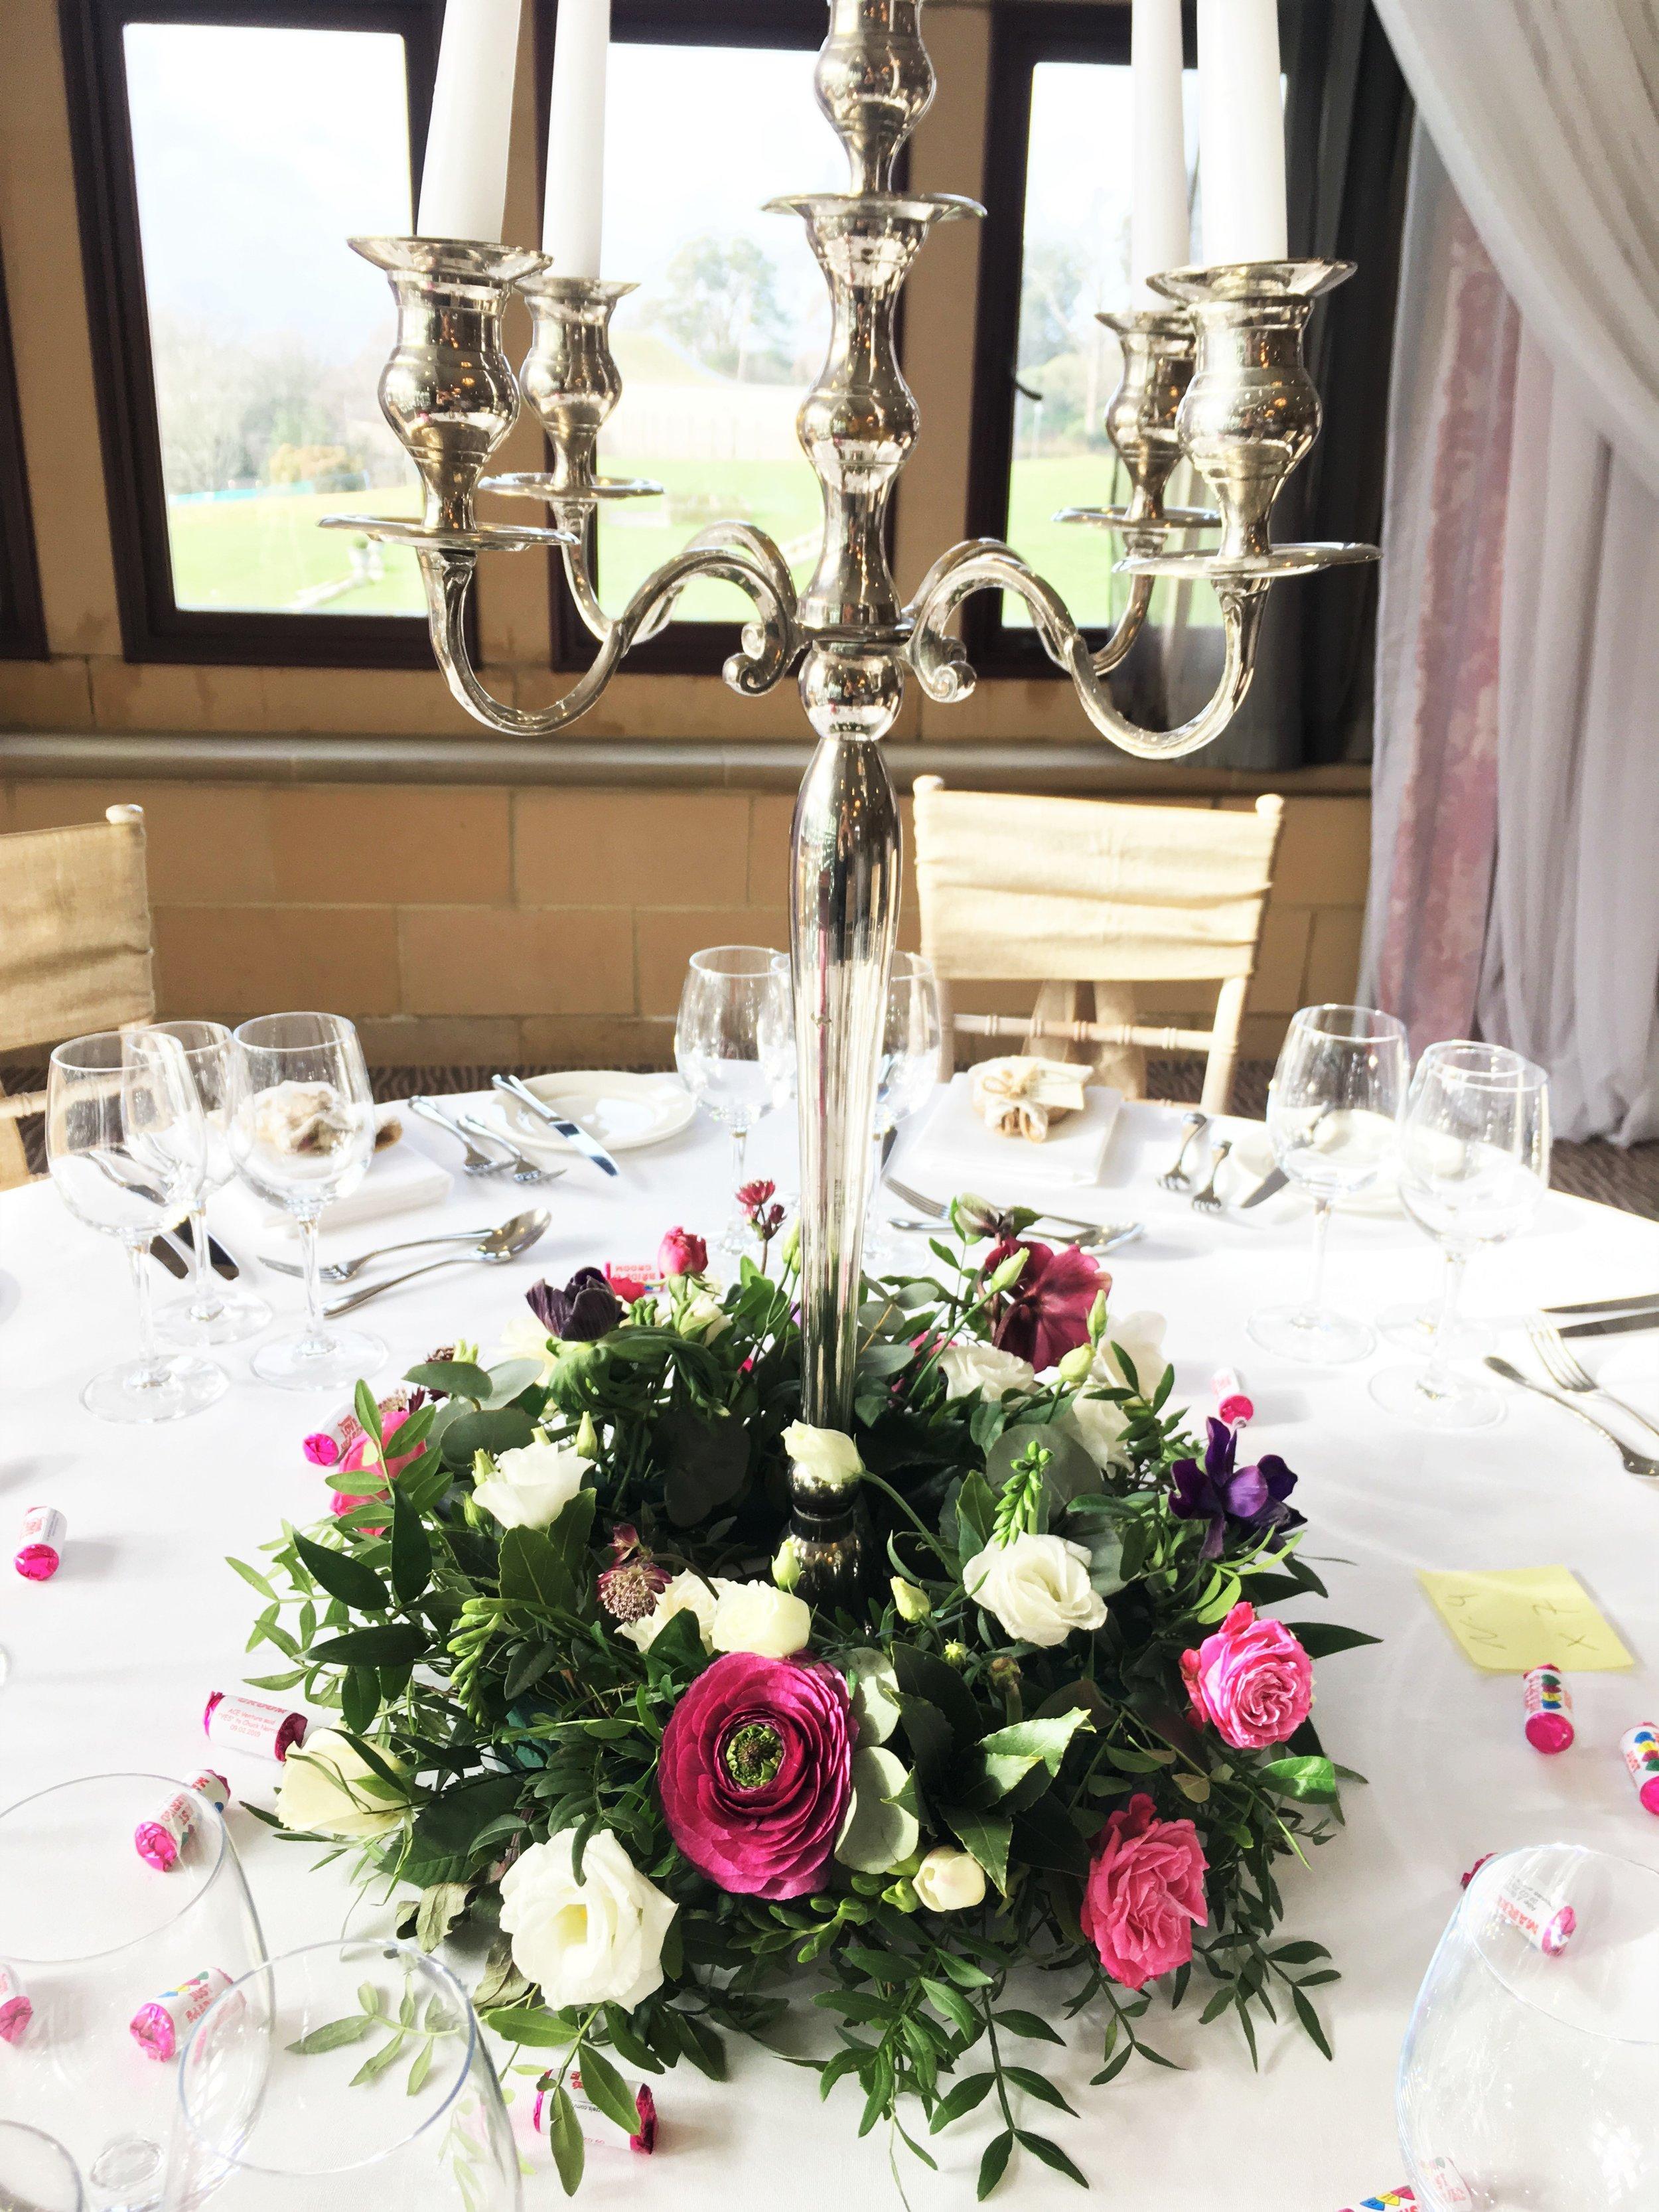 Webb-and-Farrer-Florist-Brighton-Sussex-Wedding-Flowers (21).JPG